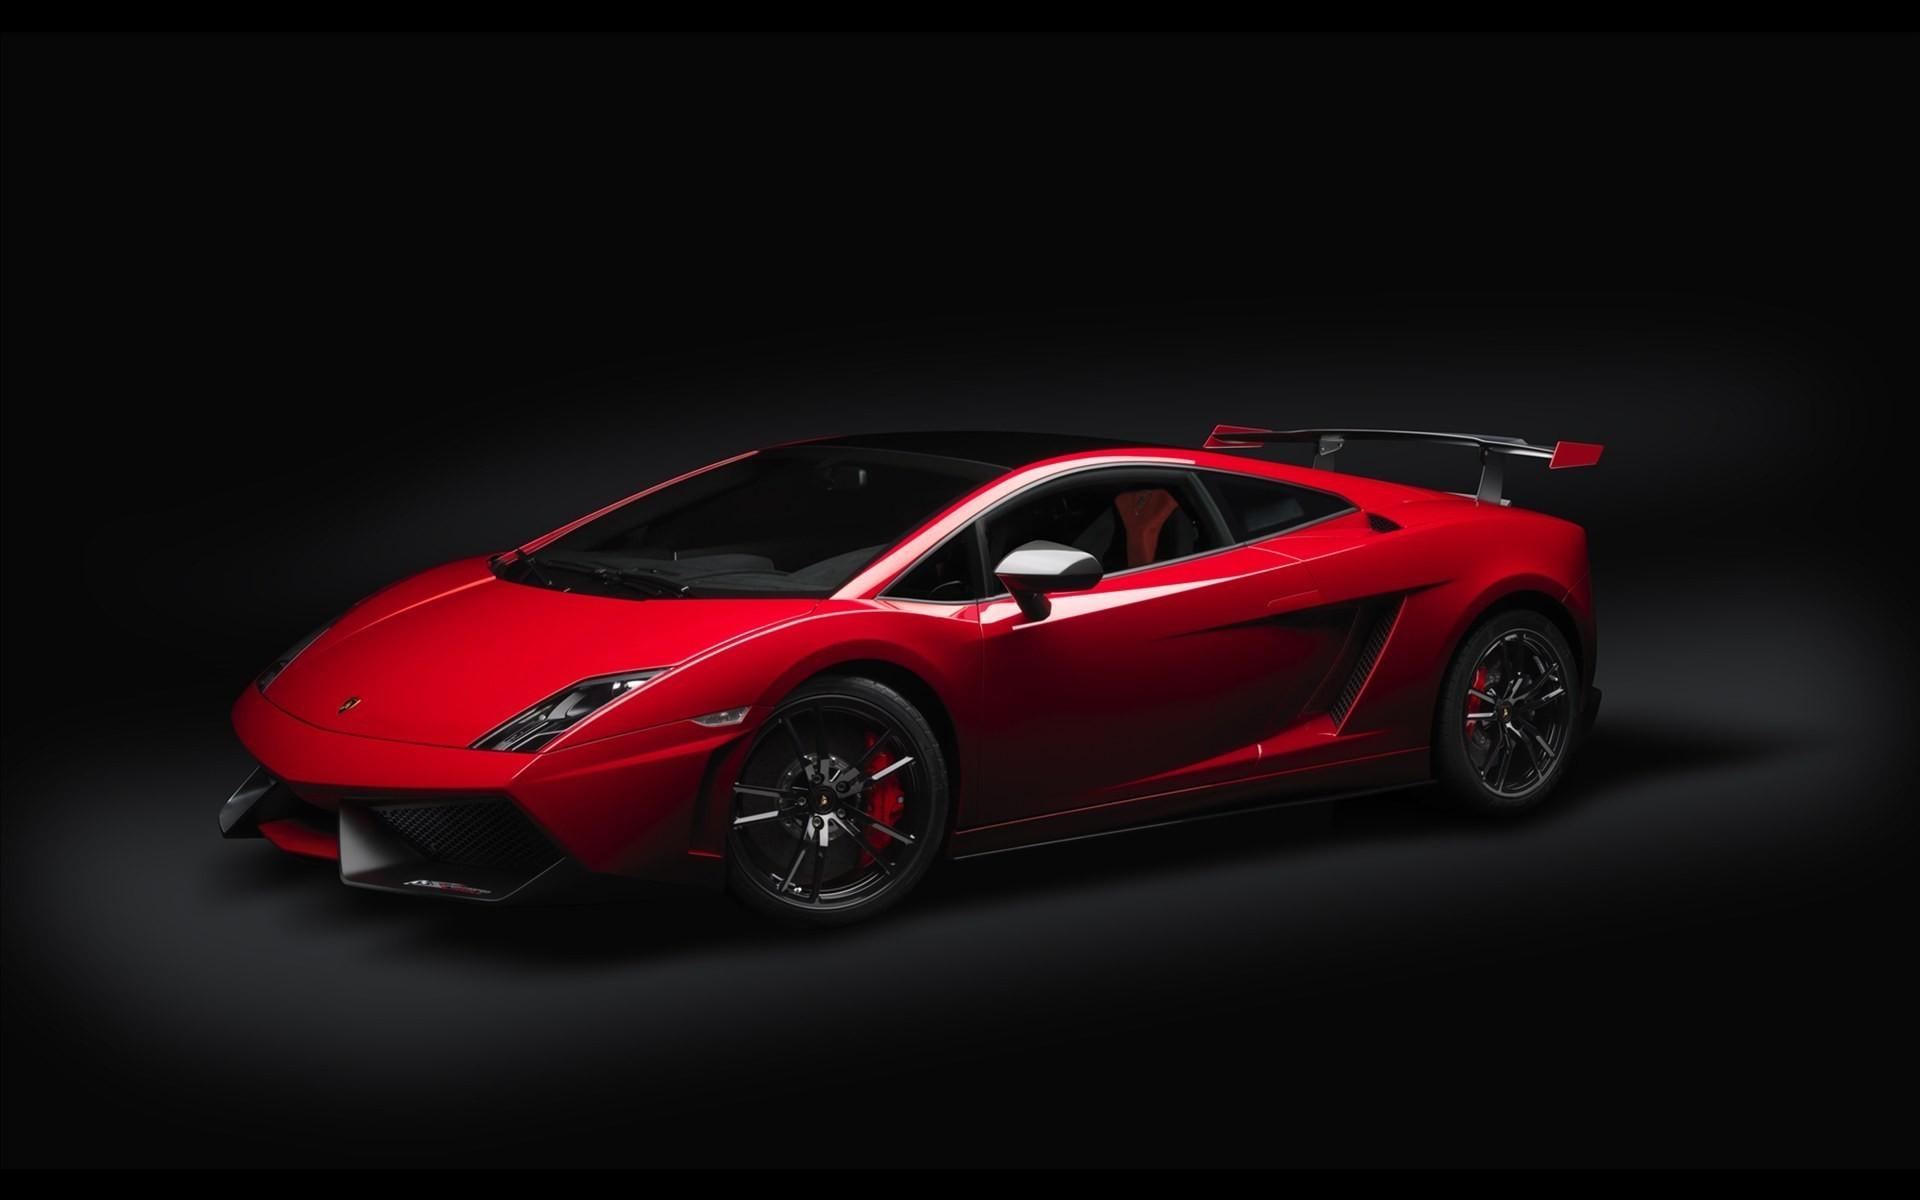 Res: 1920x1200, Lamborghini black background cars red vehicles wallpaper